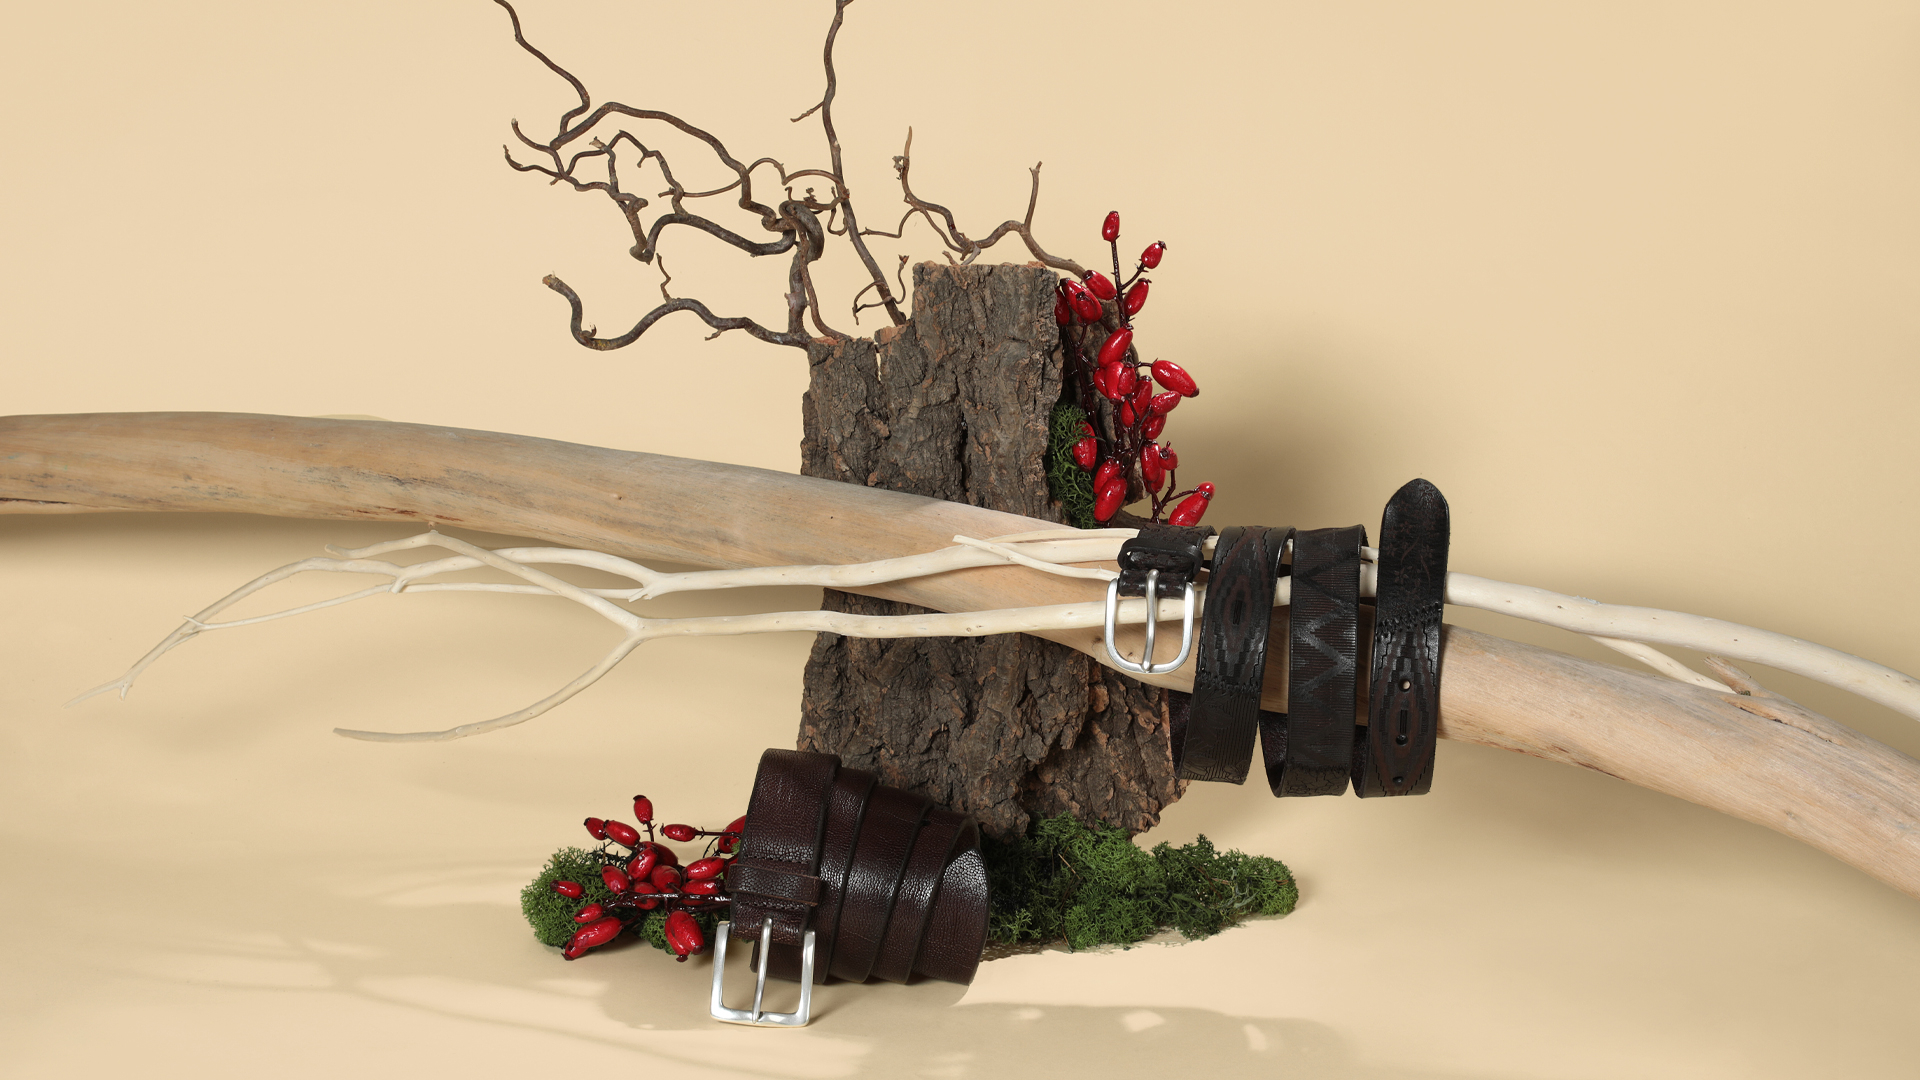 ORCIANI | Catalogo Per lui Gift guide. Per lui in pelle | Shop online